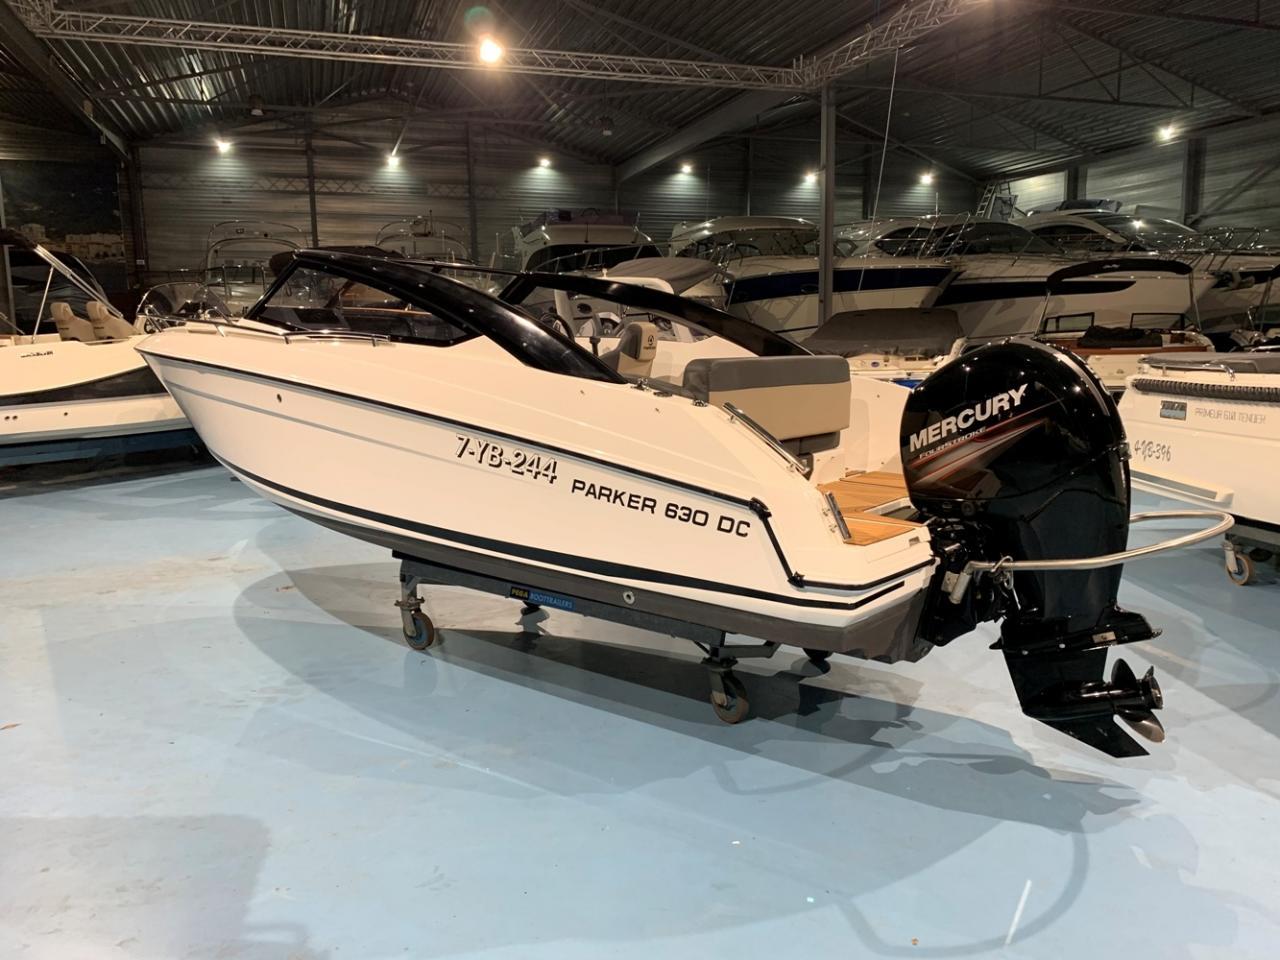 Parker 630 Day Cruiser met Mercury 150 pk 5